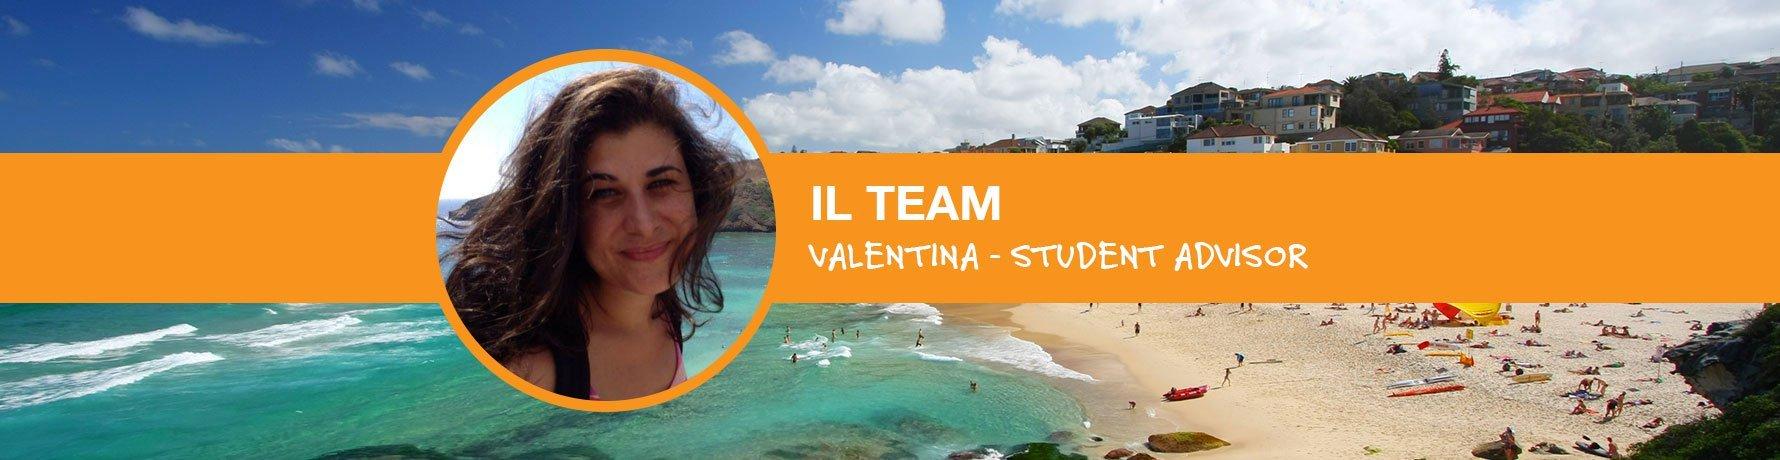 Il Team si presenta: Valentina - Student Advisor